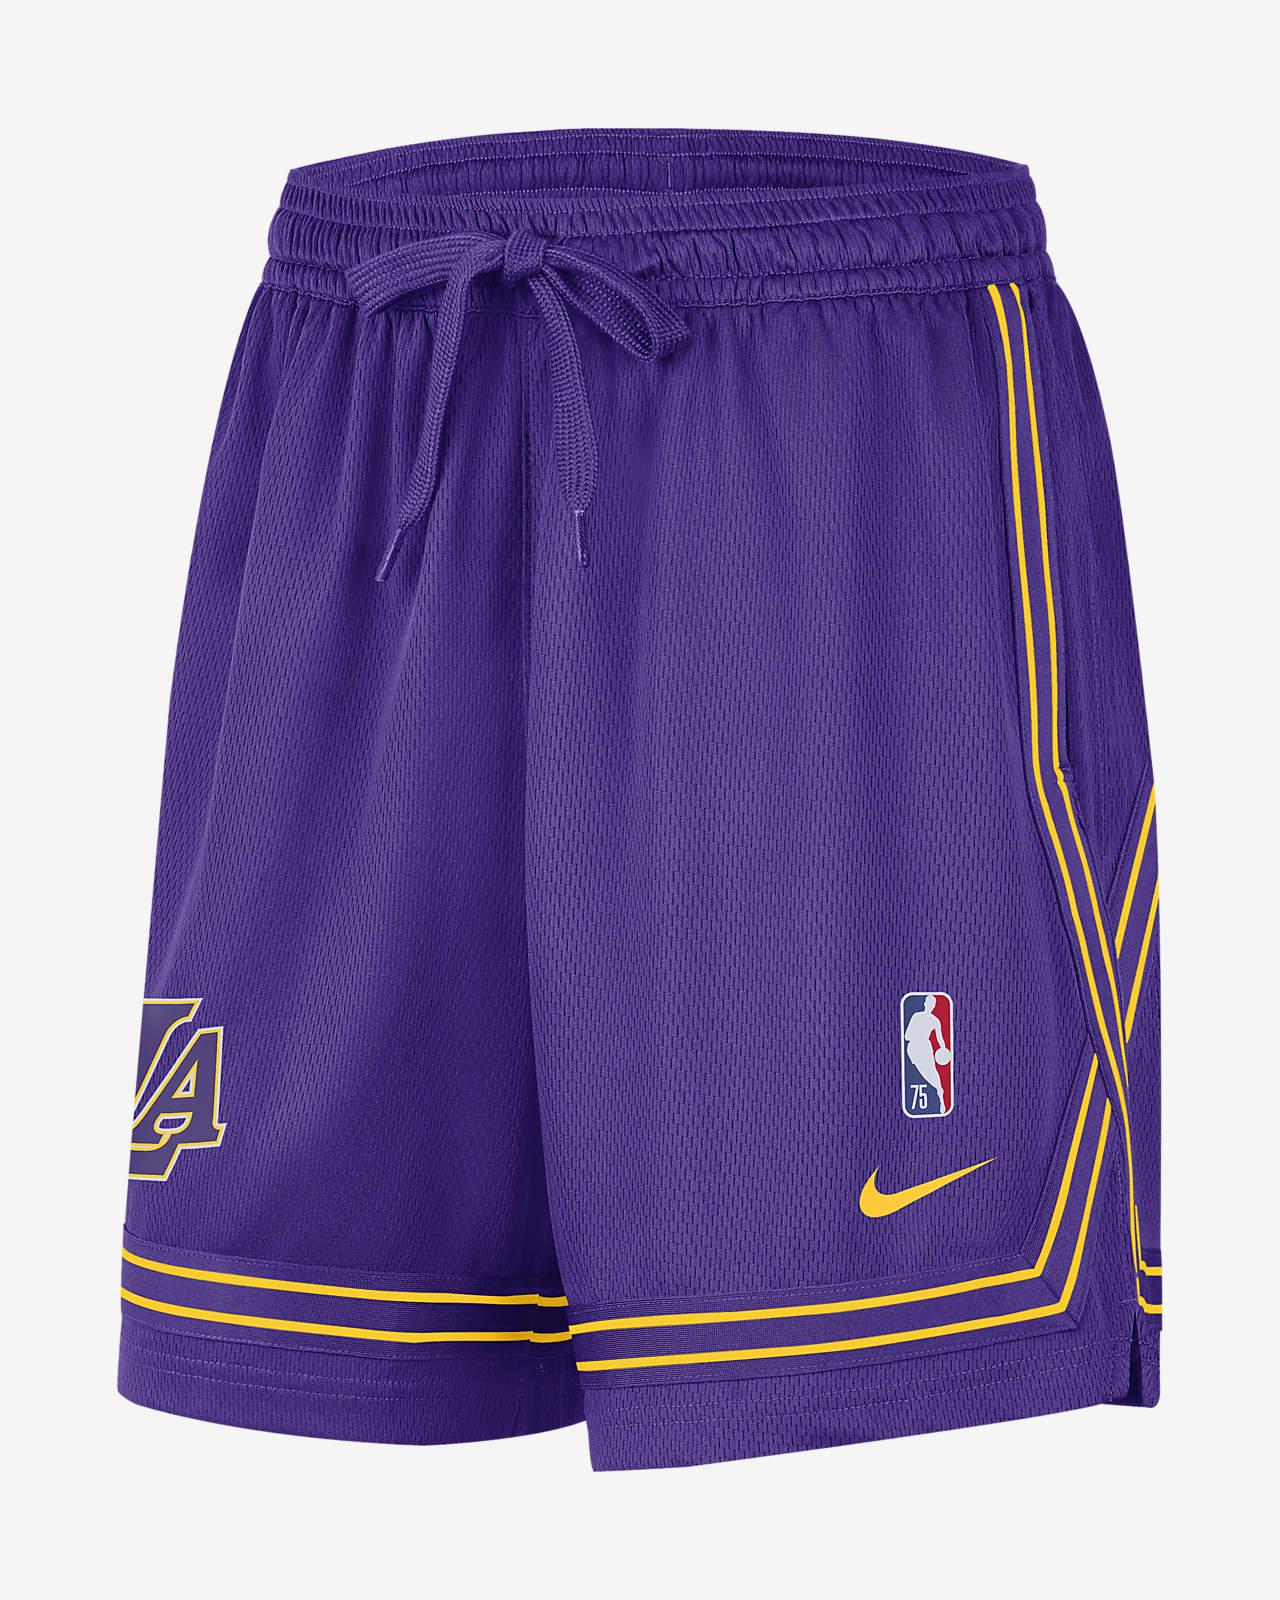 Los Angeles Lakers Courtside Women's Nike NBA Shorts